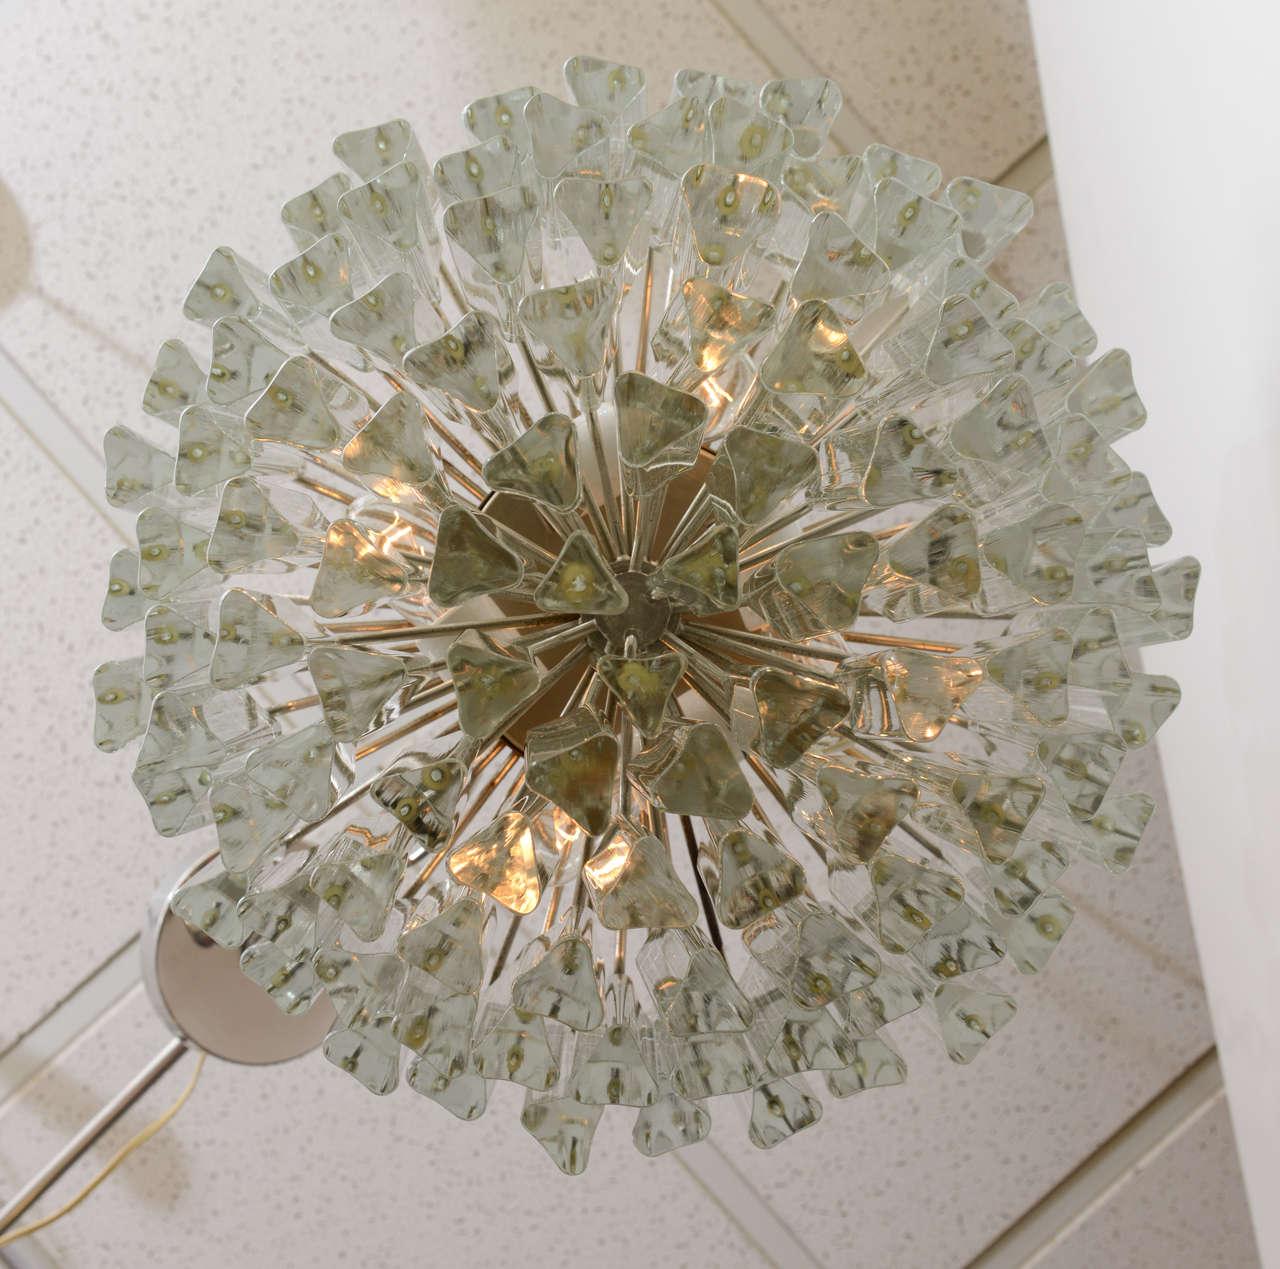 Italian Lush Camer Glass Chandelier with Venini Triedri Crystals For Sale